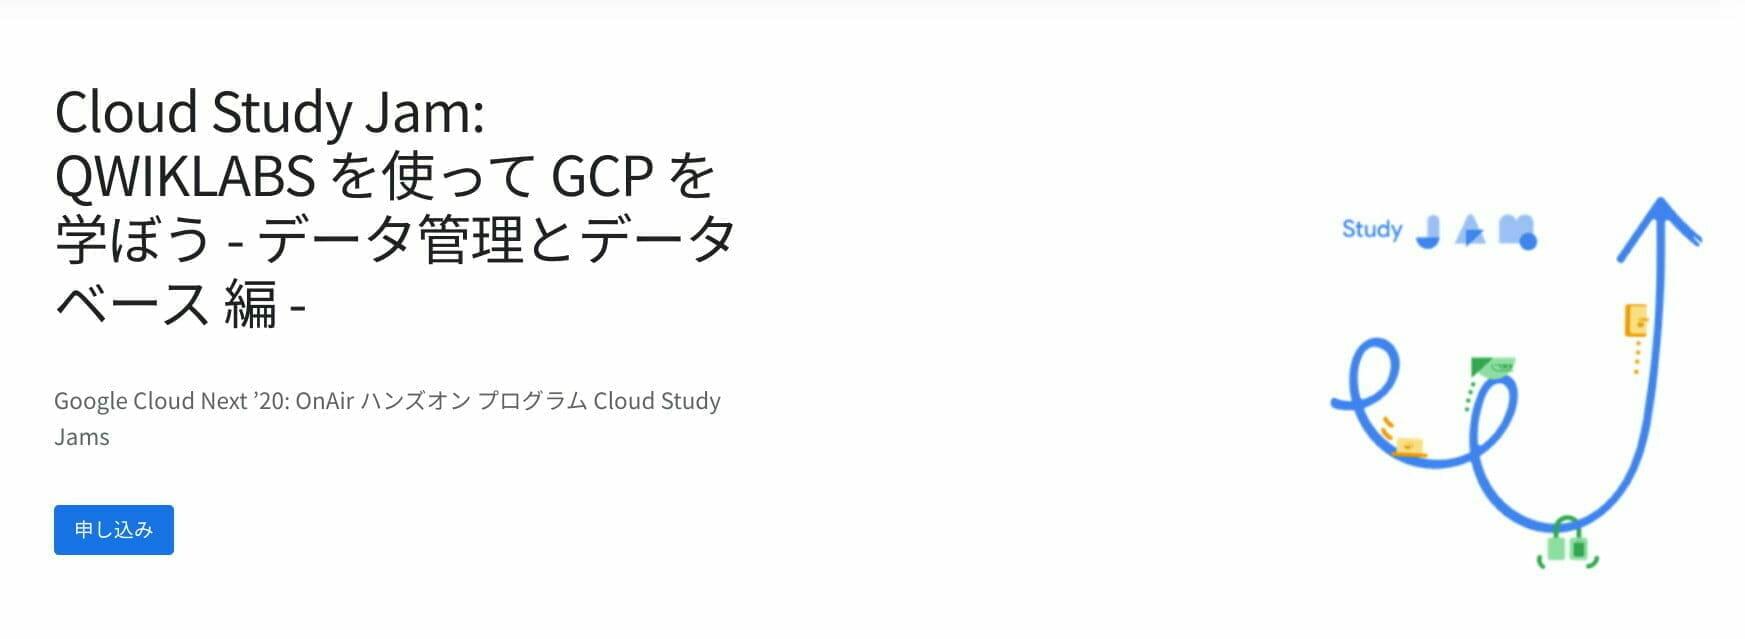 Cloud Study Jam: QWIKLABS を使って GCP を学ぼう - データ管理とデータベース 編 -